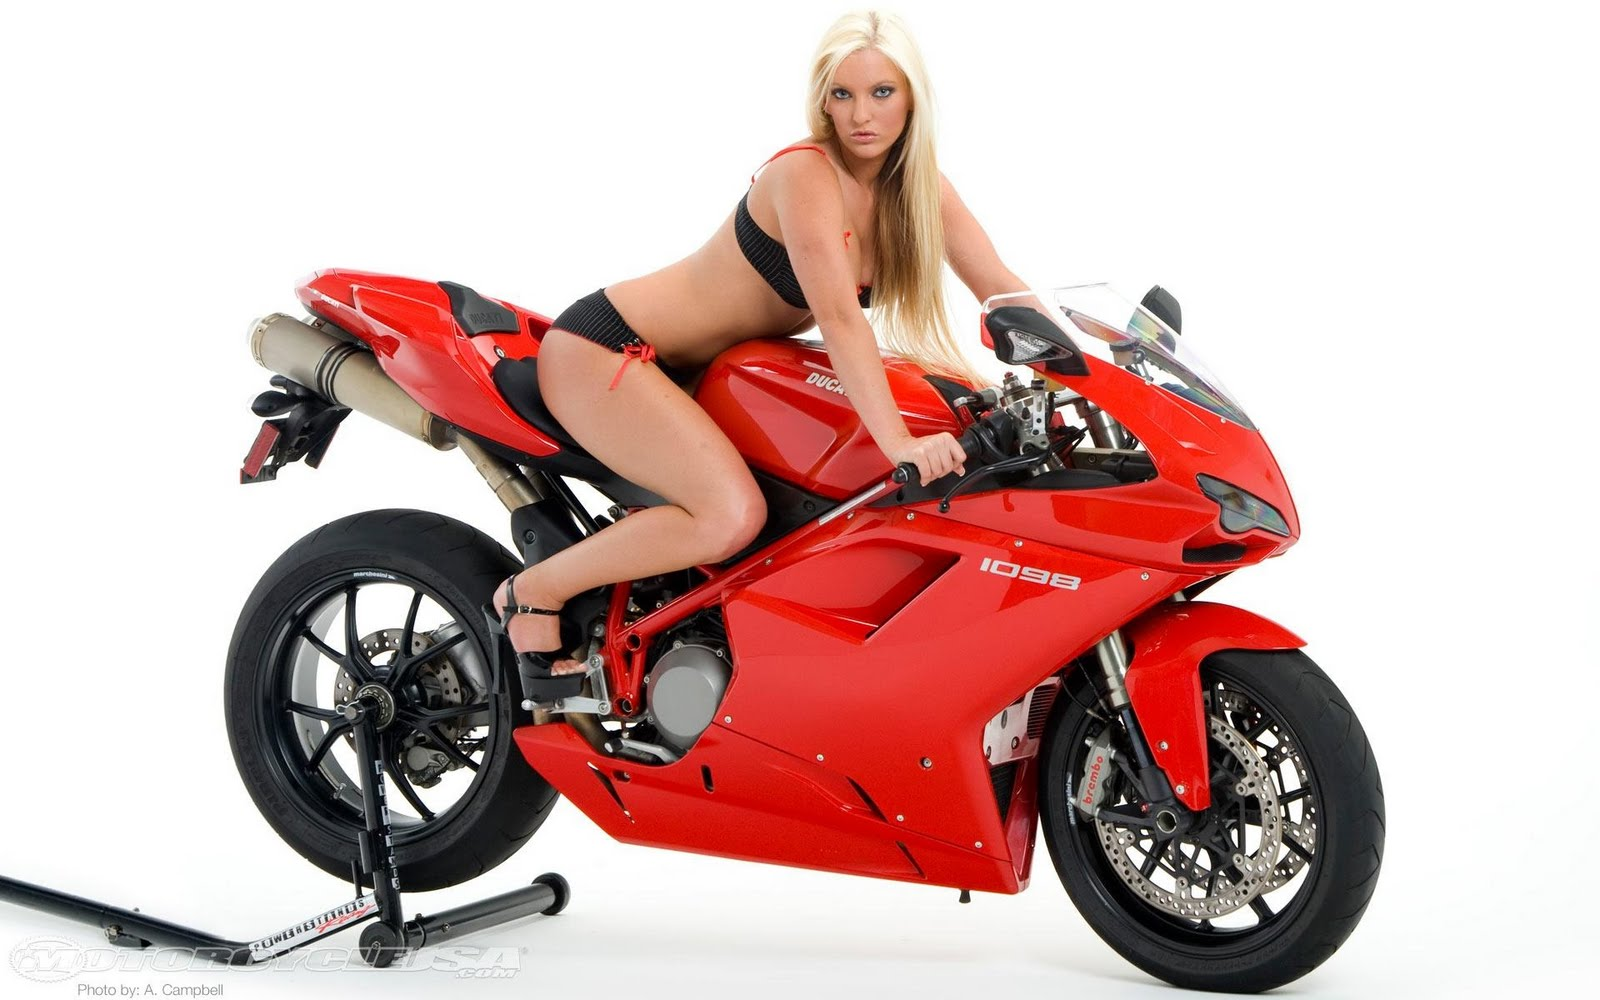 Big boob naked bikes girl, disgusing anal porn